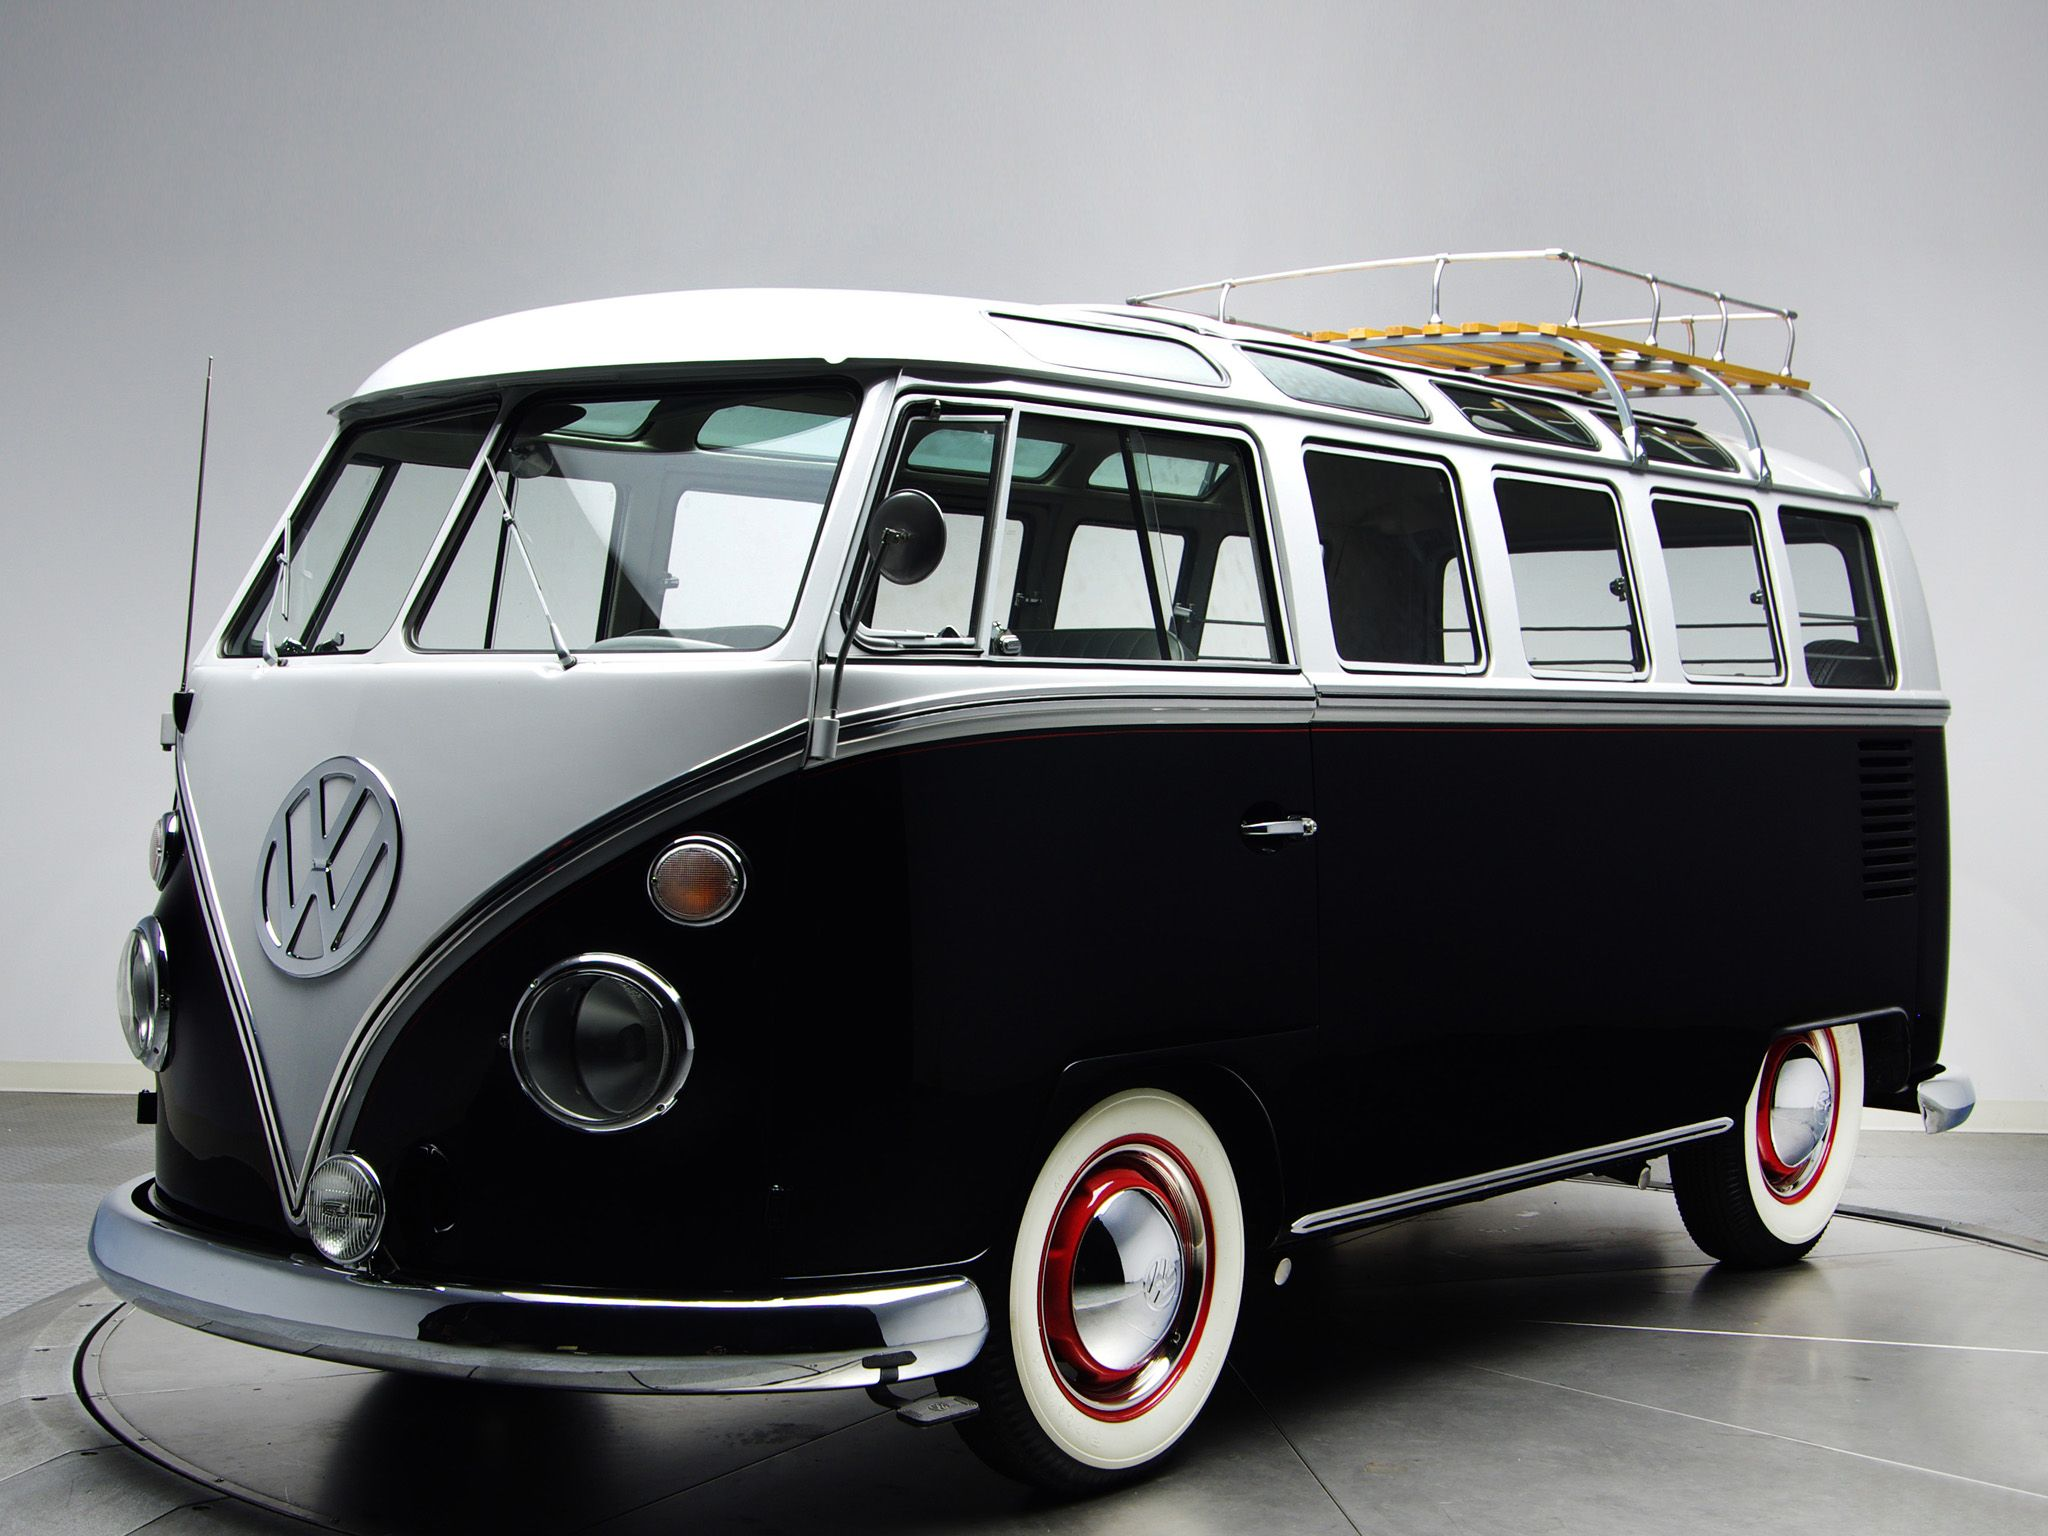 volkswagen t1 deluxe samba bus teardrops and campers. Black Bedroom Furniture Sets. Home Design Ideas